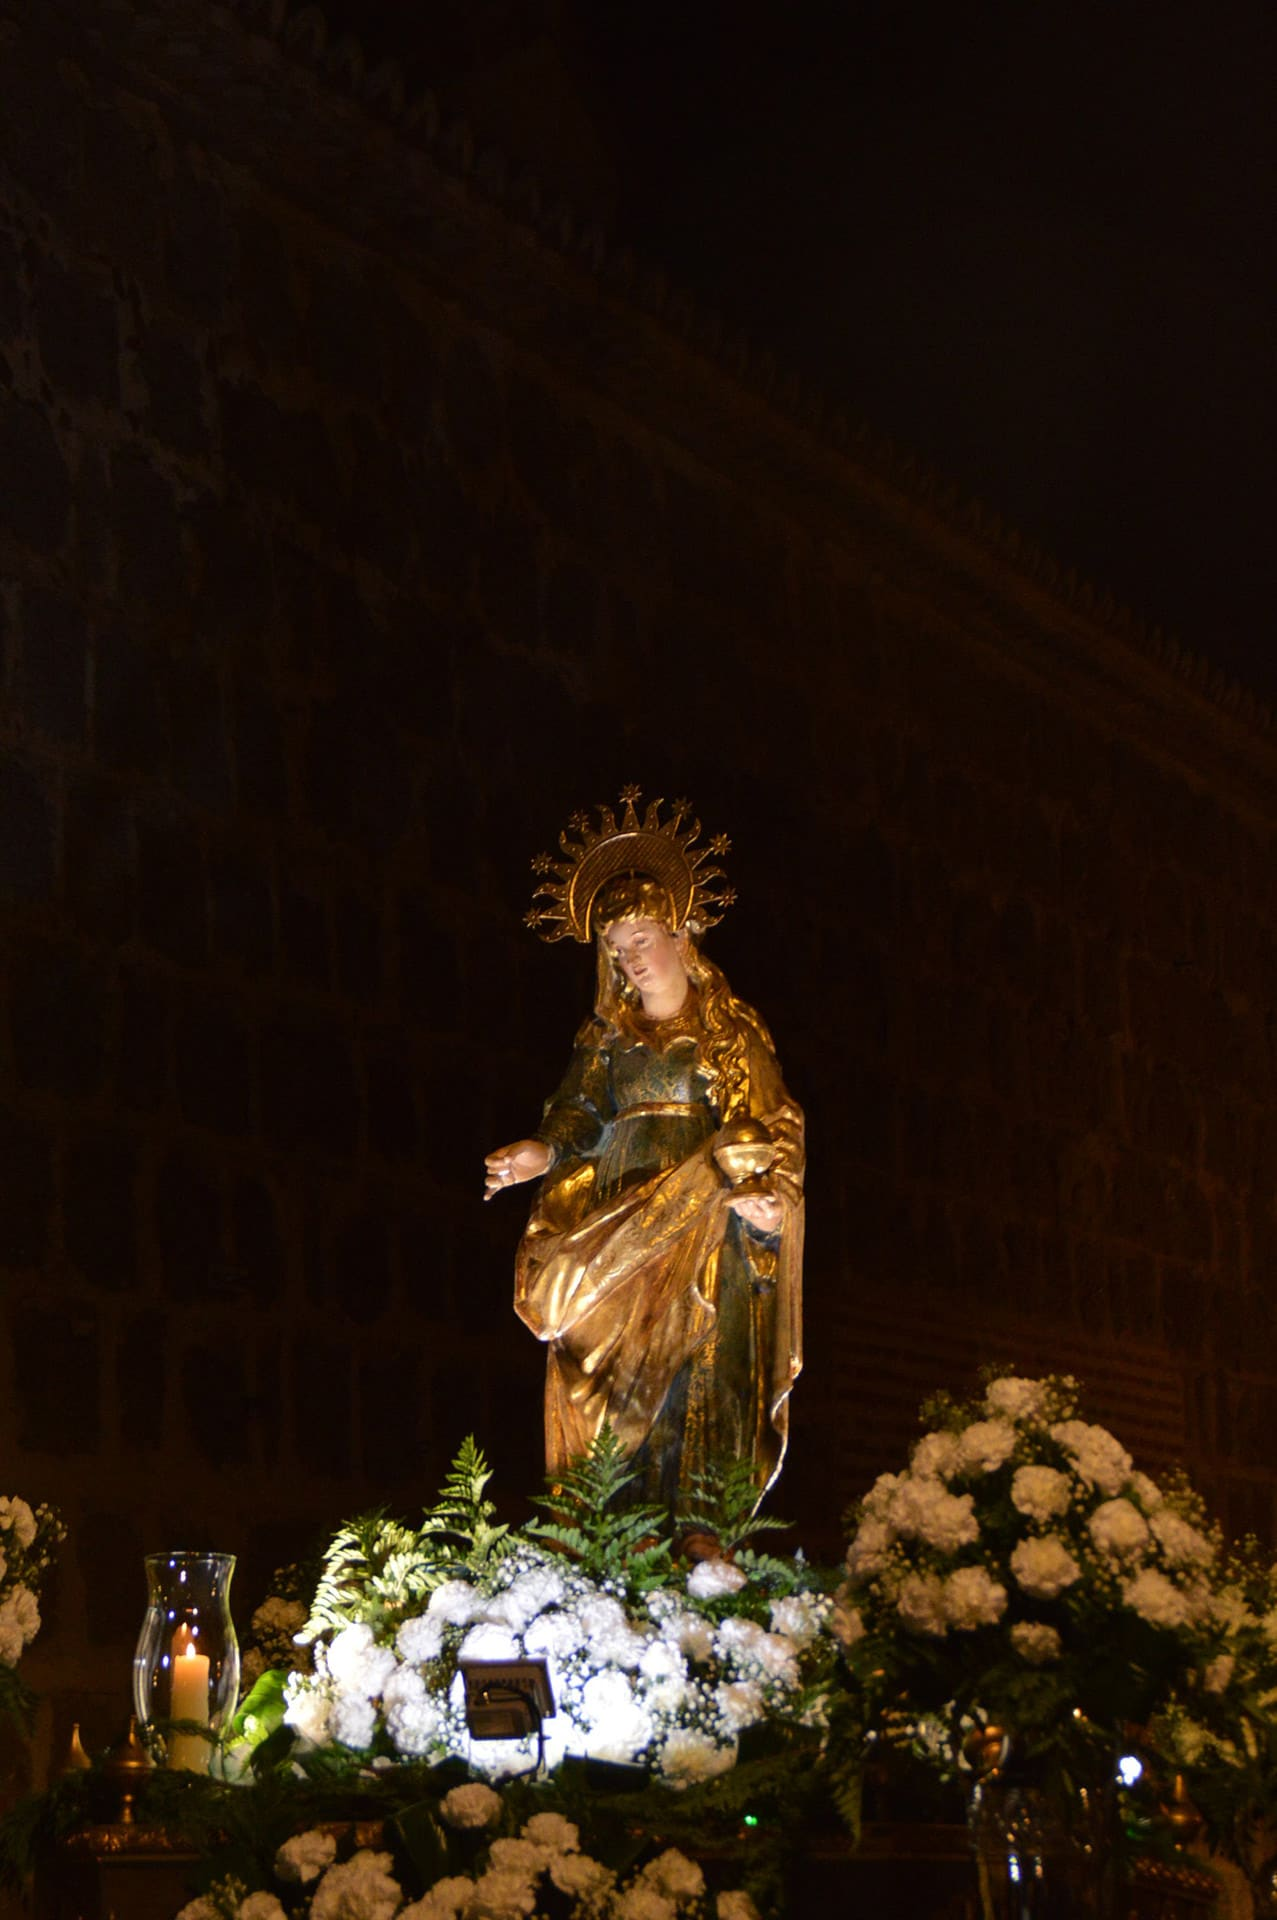 El Miserere, Ávila1